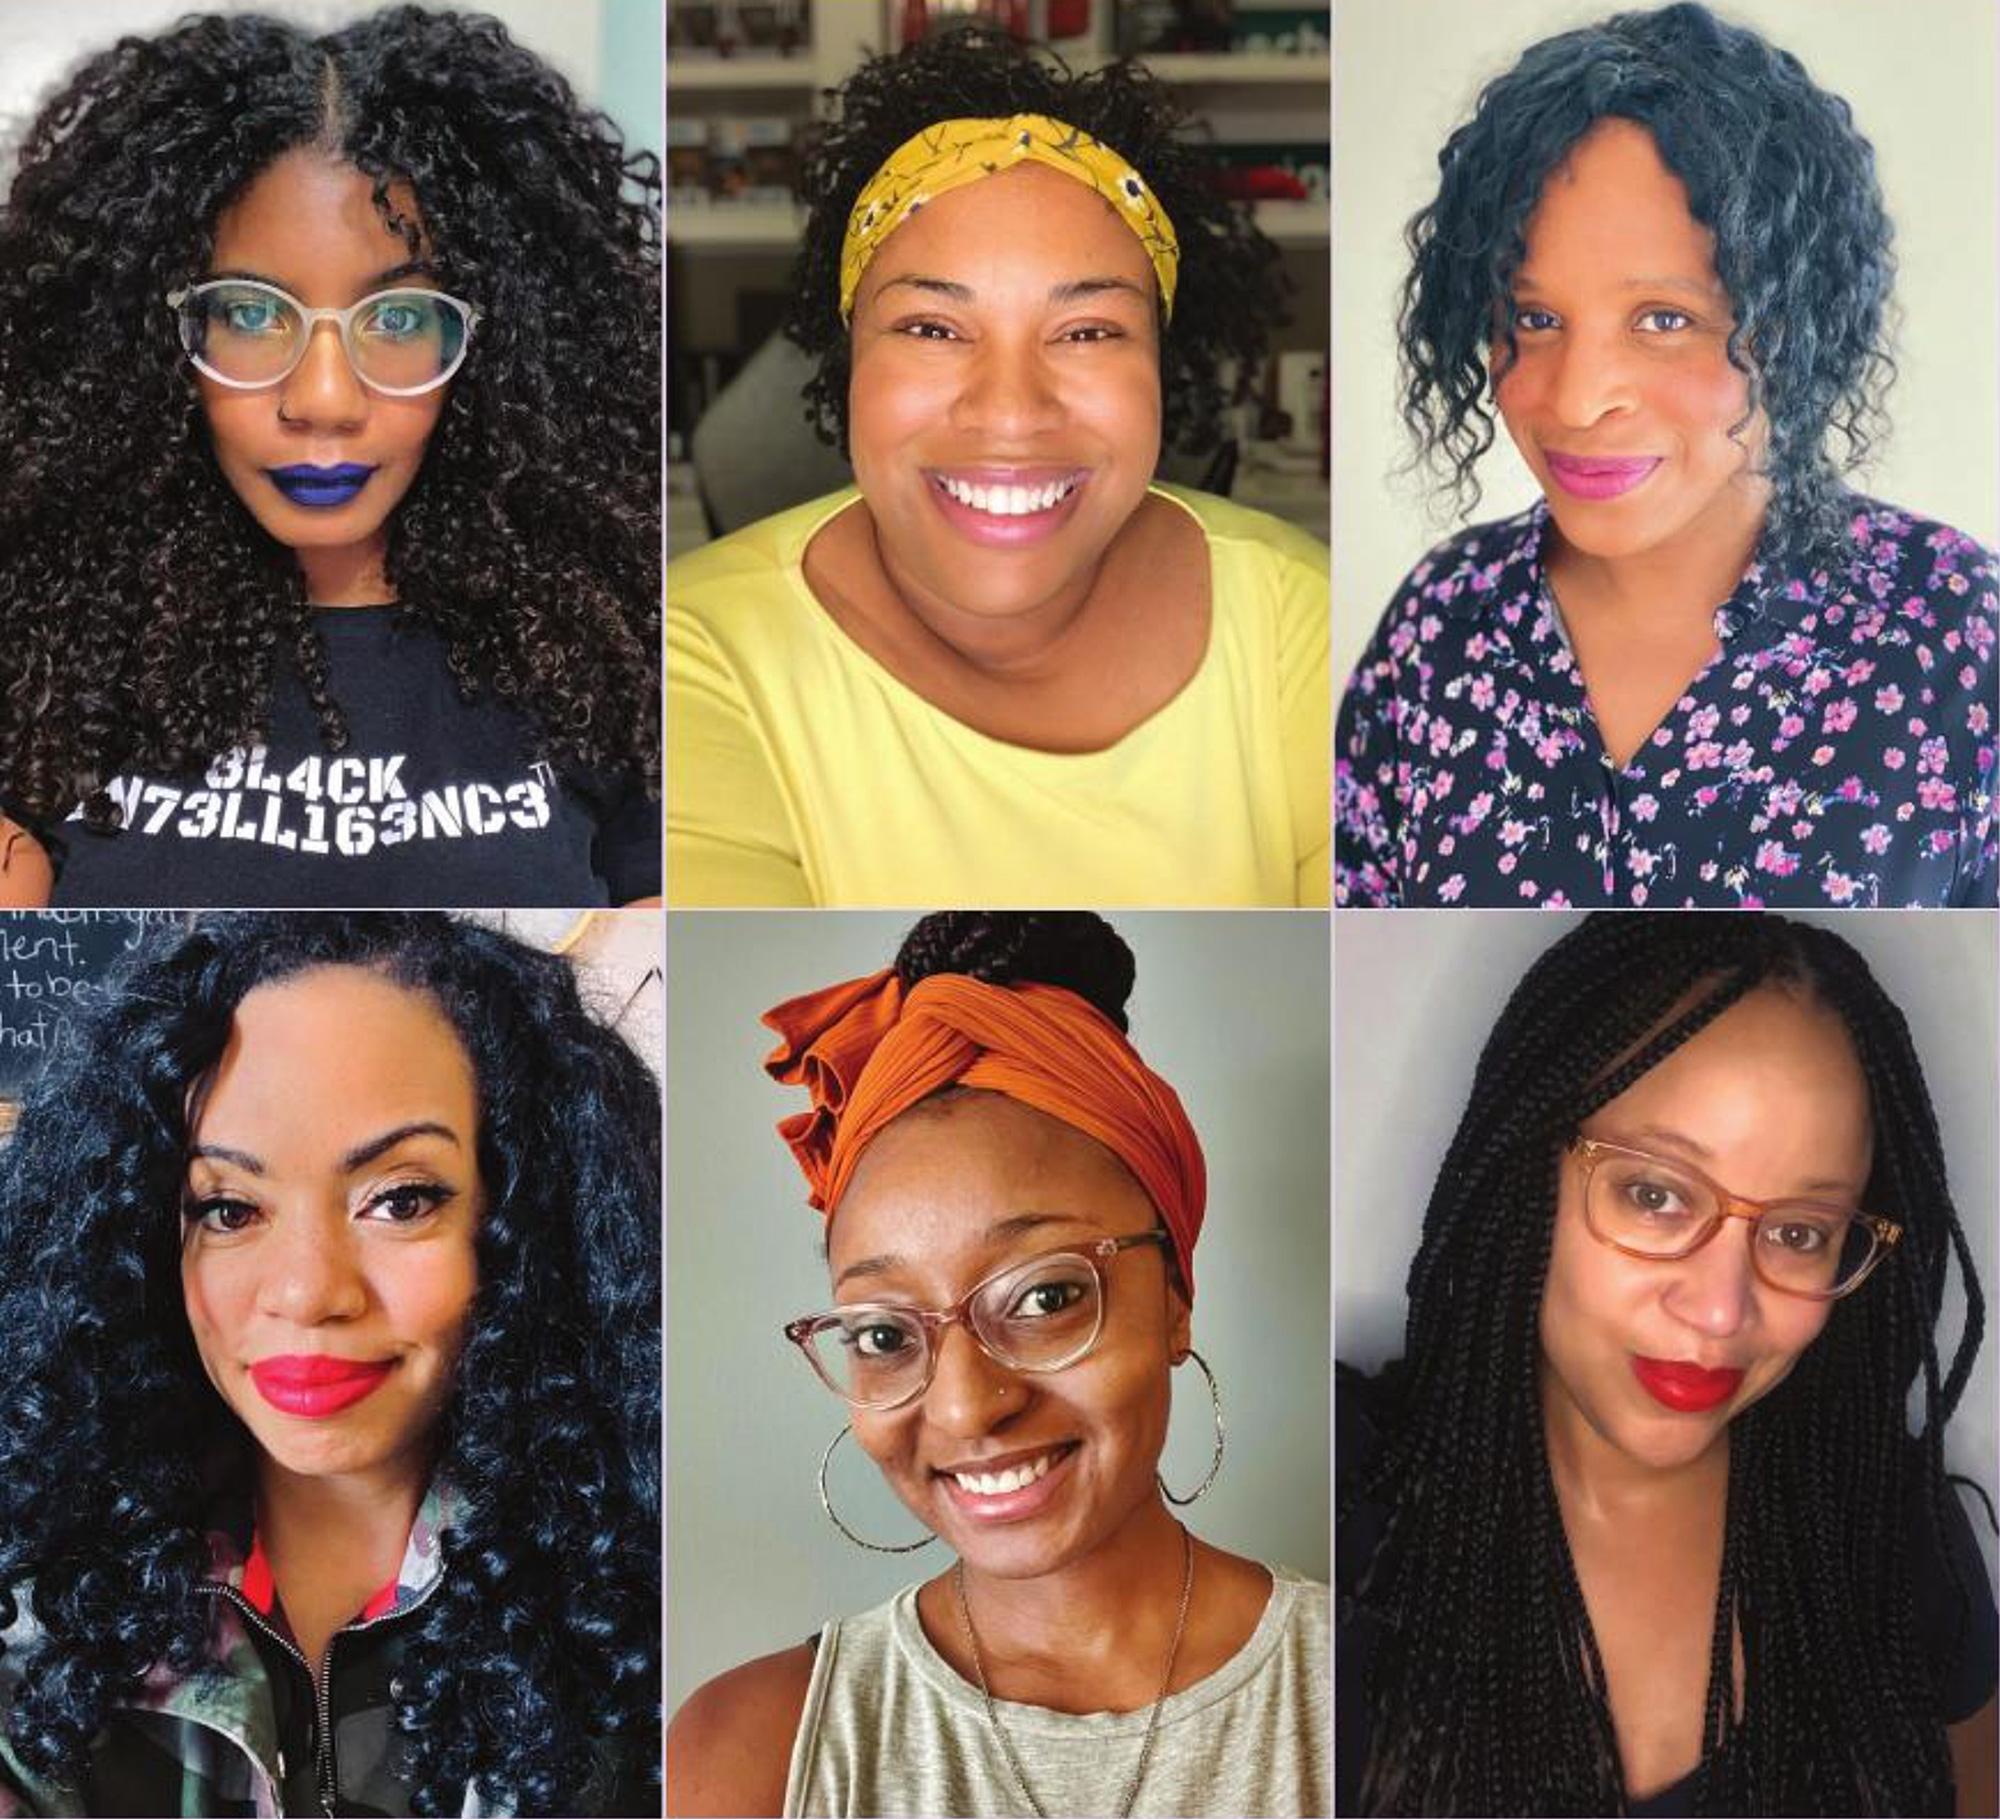 Blackout by Dhonielle Clayton, Tiffany D. Jackson, Nic Stone, Angie Thomas, Ashley Woodfolk, Nicola Yoon